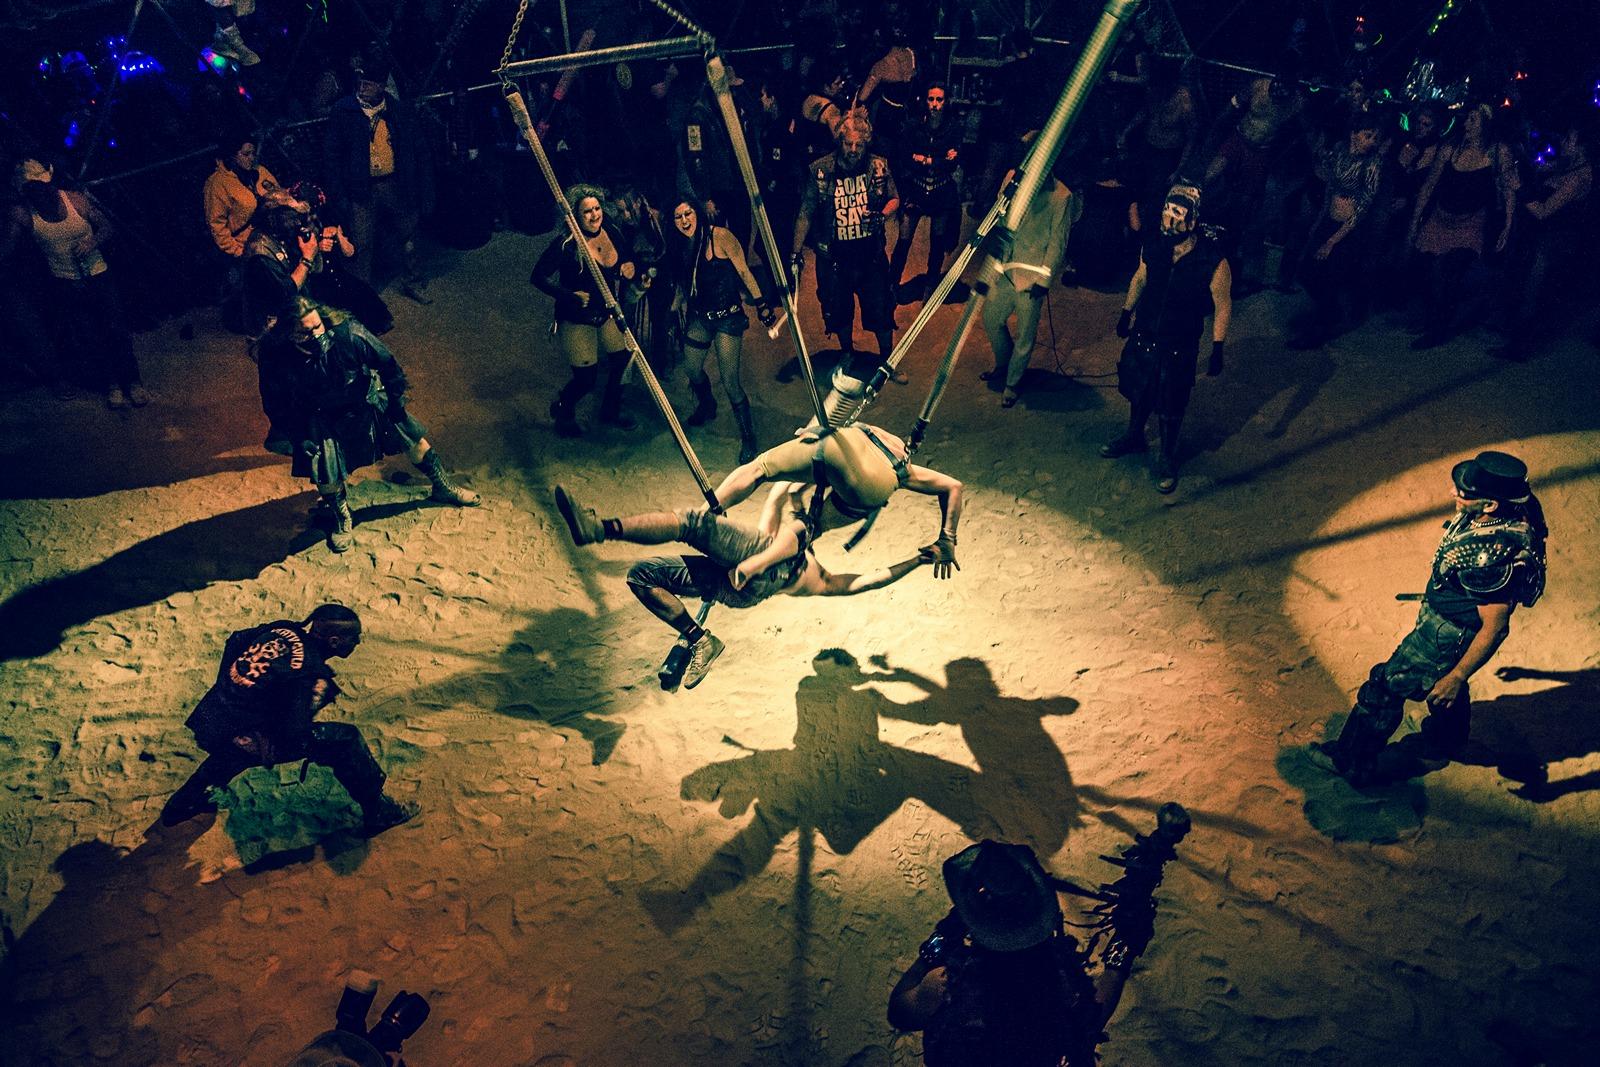 Burning Man - Thunderdome 2